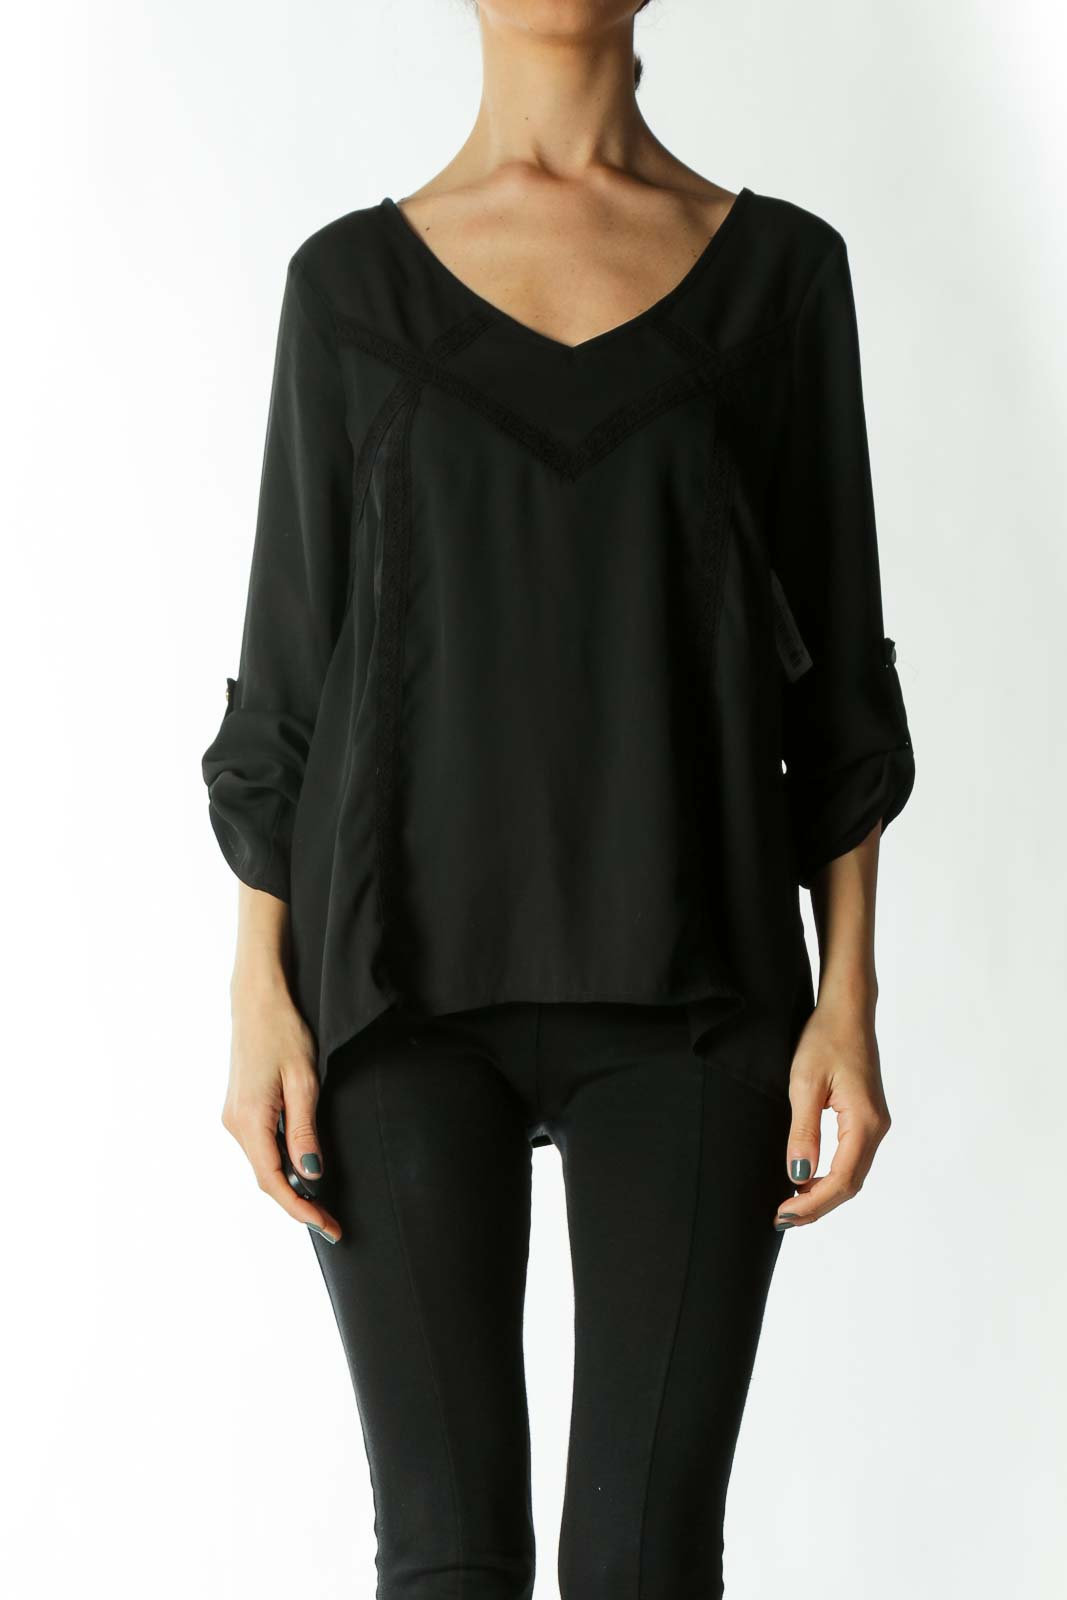 Black Translucent Lace-Detailing Back-Strap Long-Sleeve Blouse Front